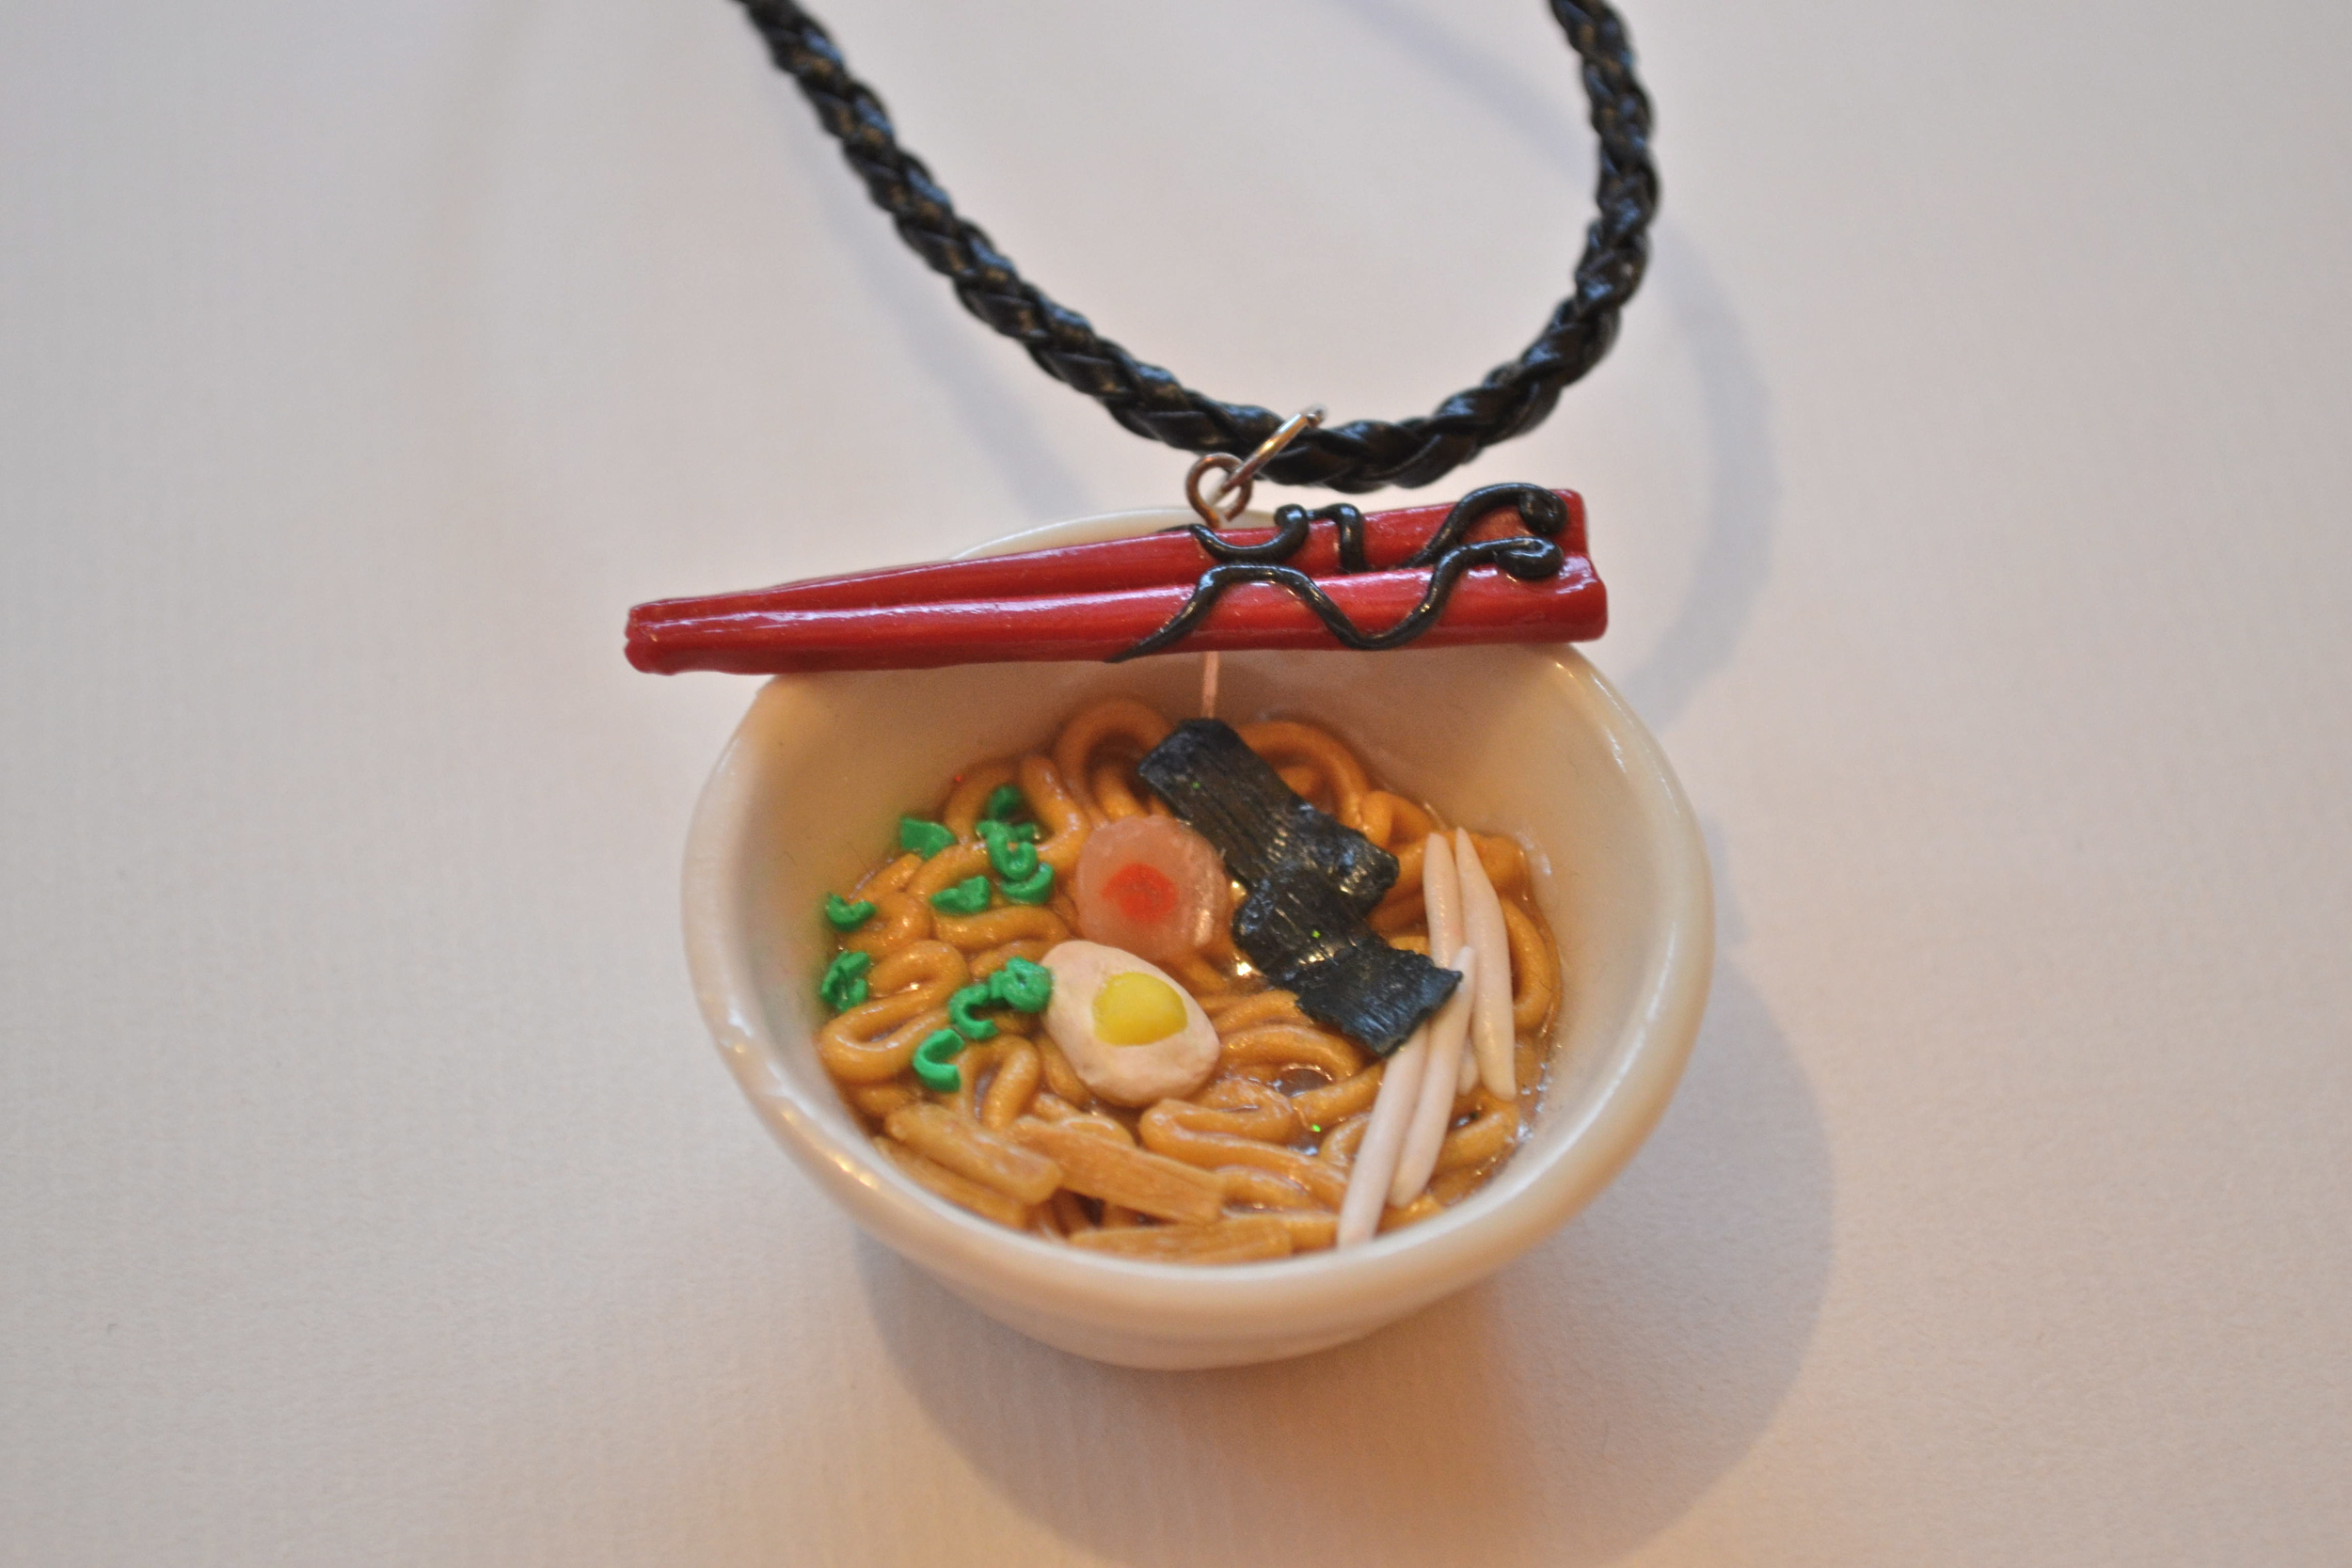 Ramen Bowl Necklace